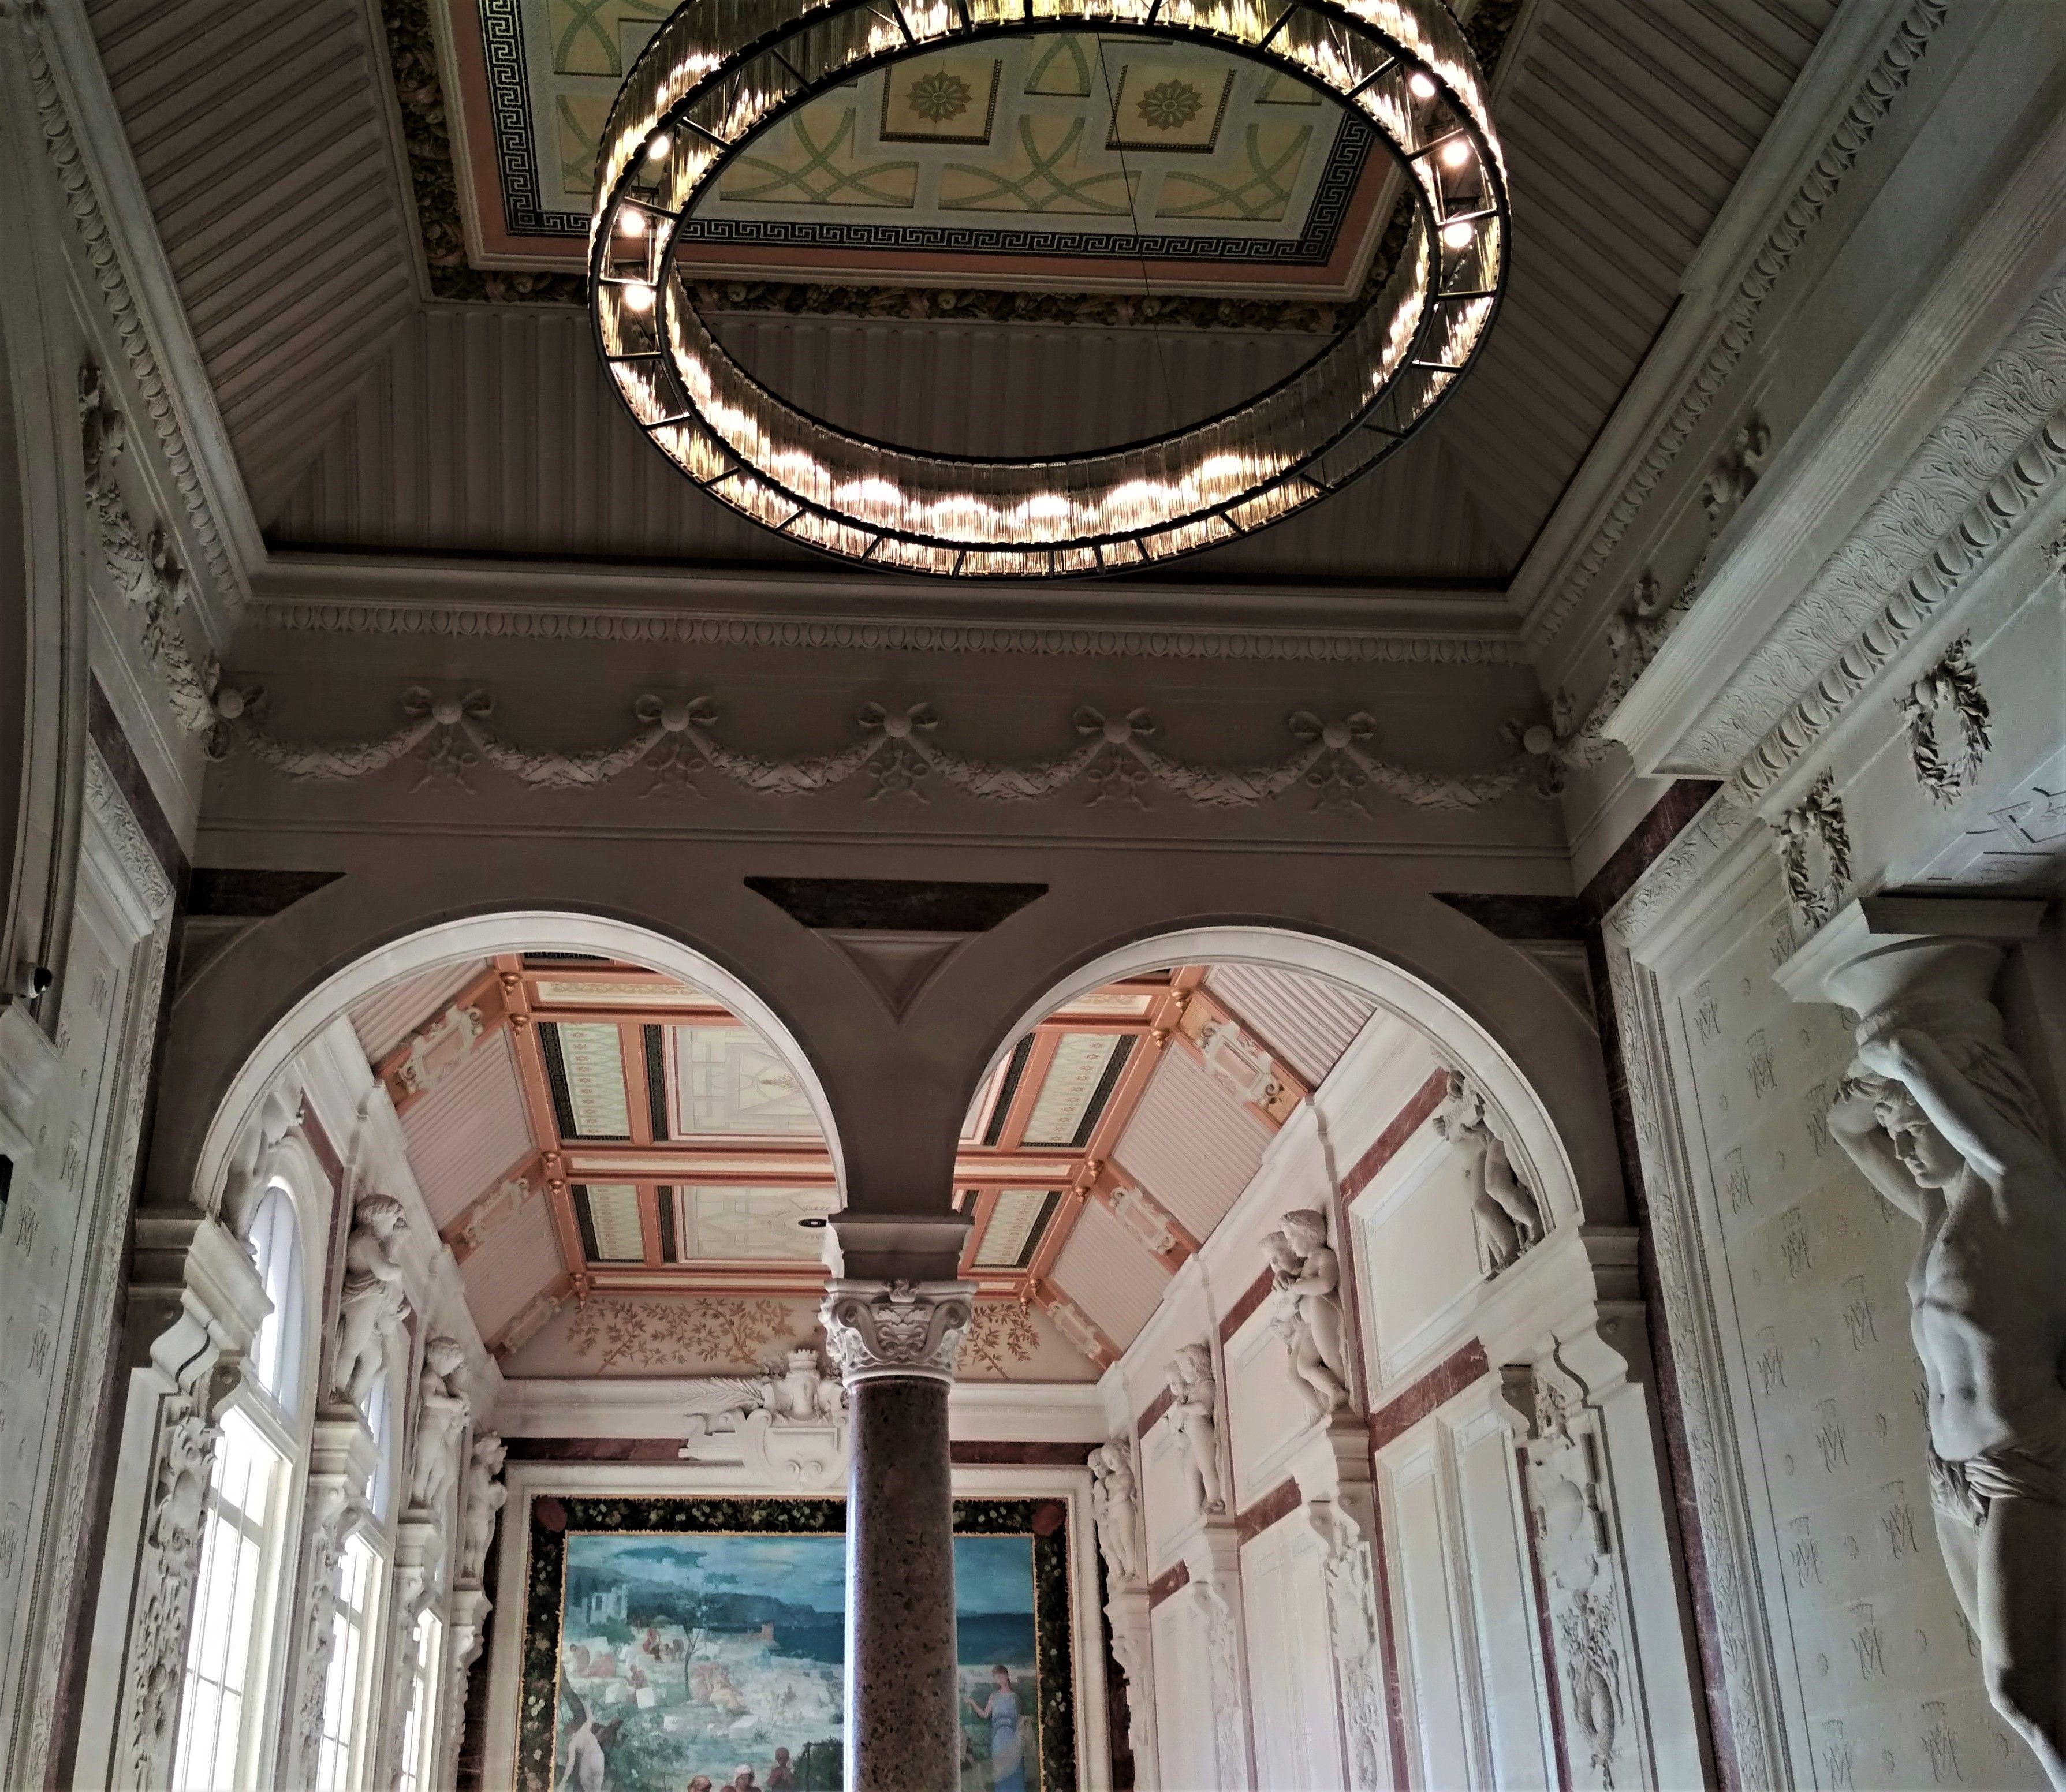 Musée des Beaux-Arts, Marseille: All Year